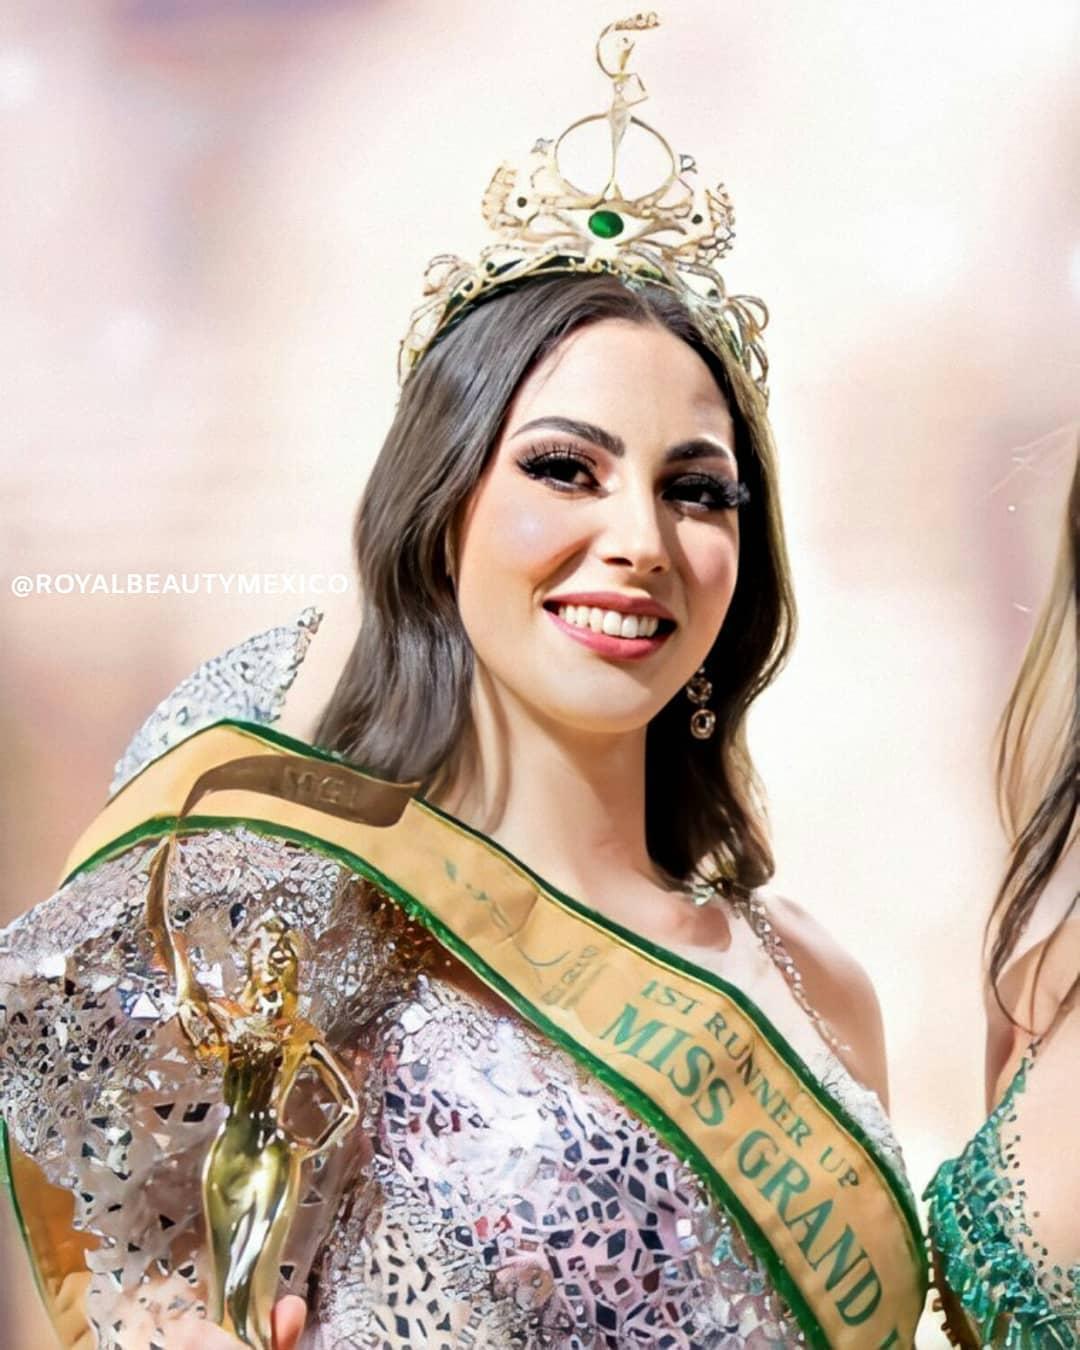 maria malo, 1st runner-up de miss grand international 2019. - Página 18 10137710